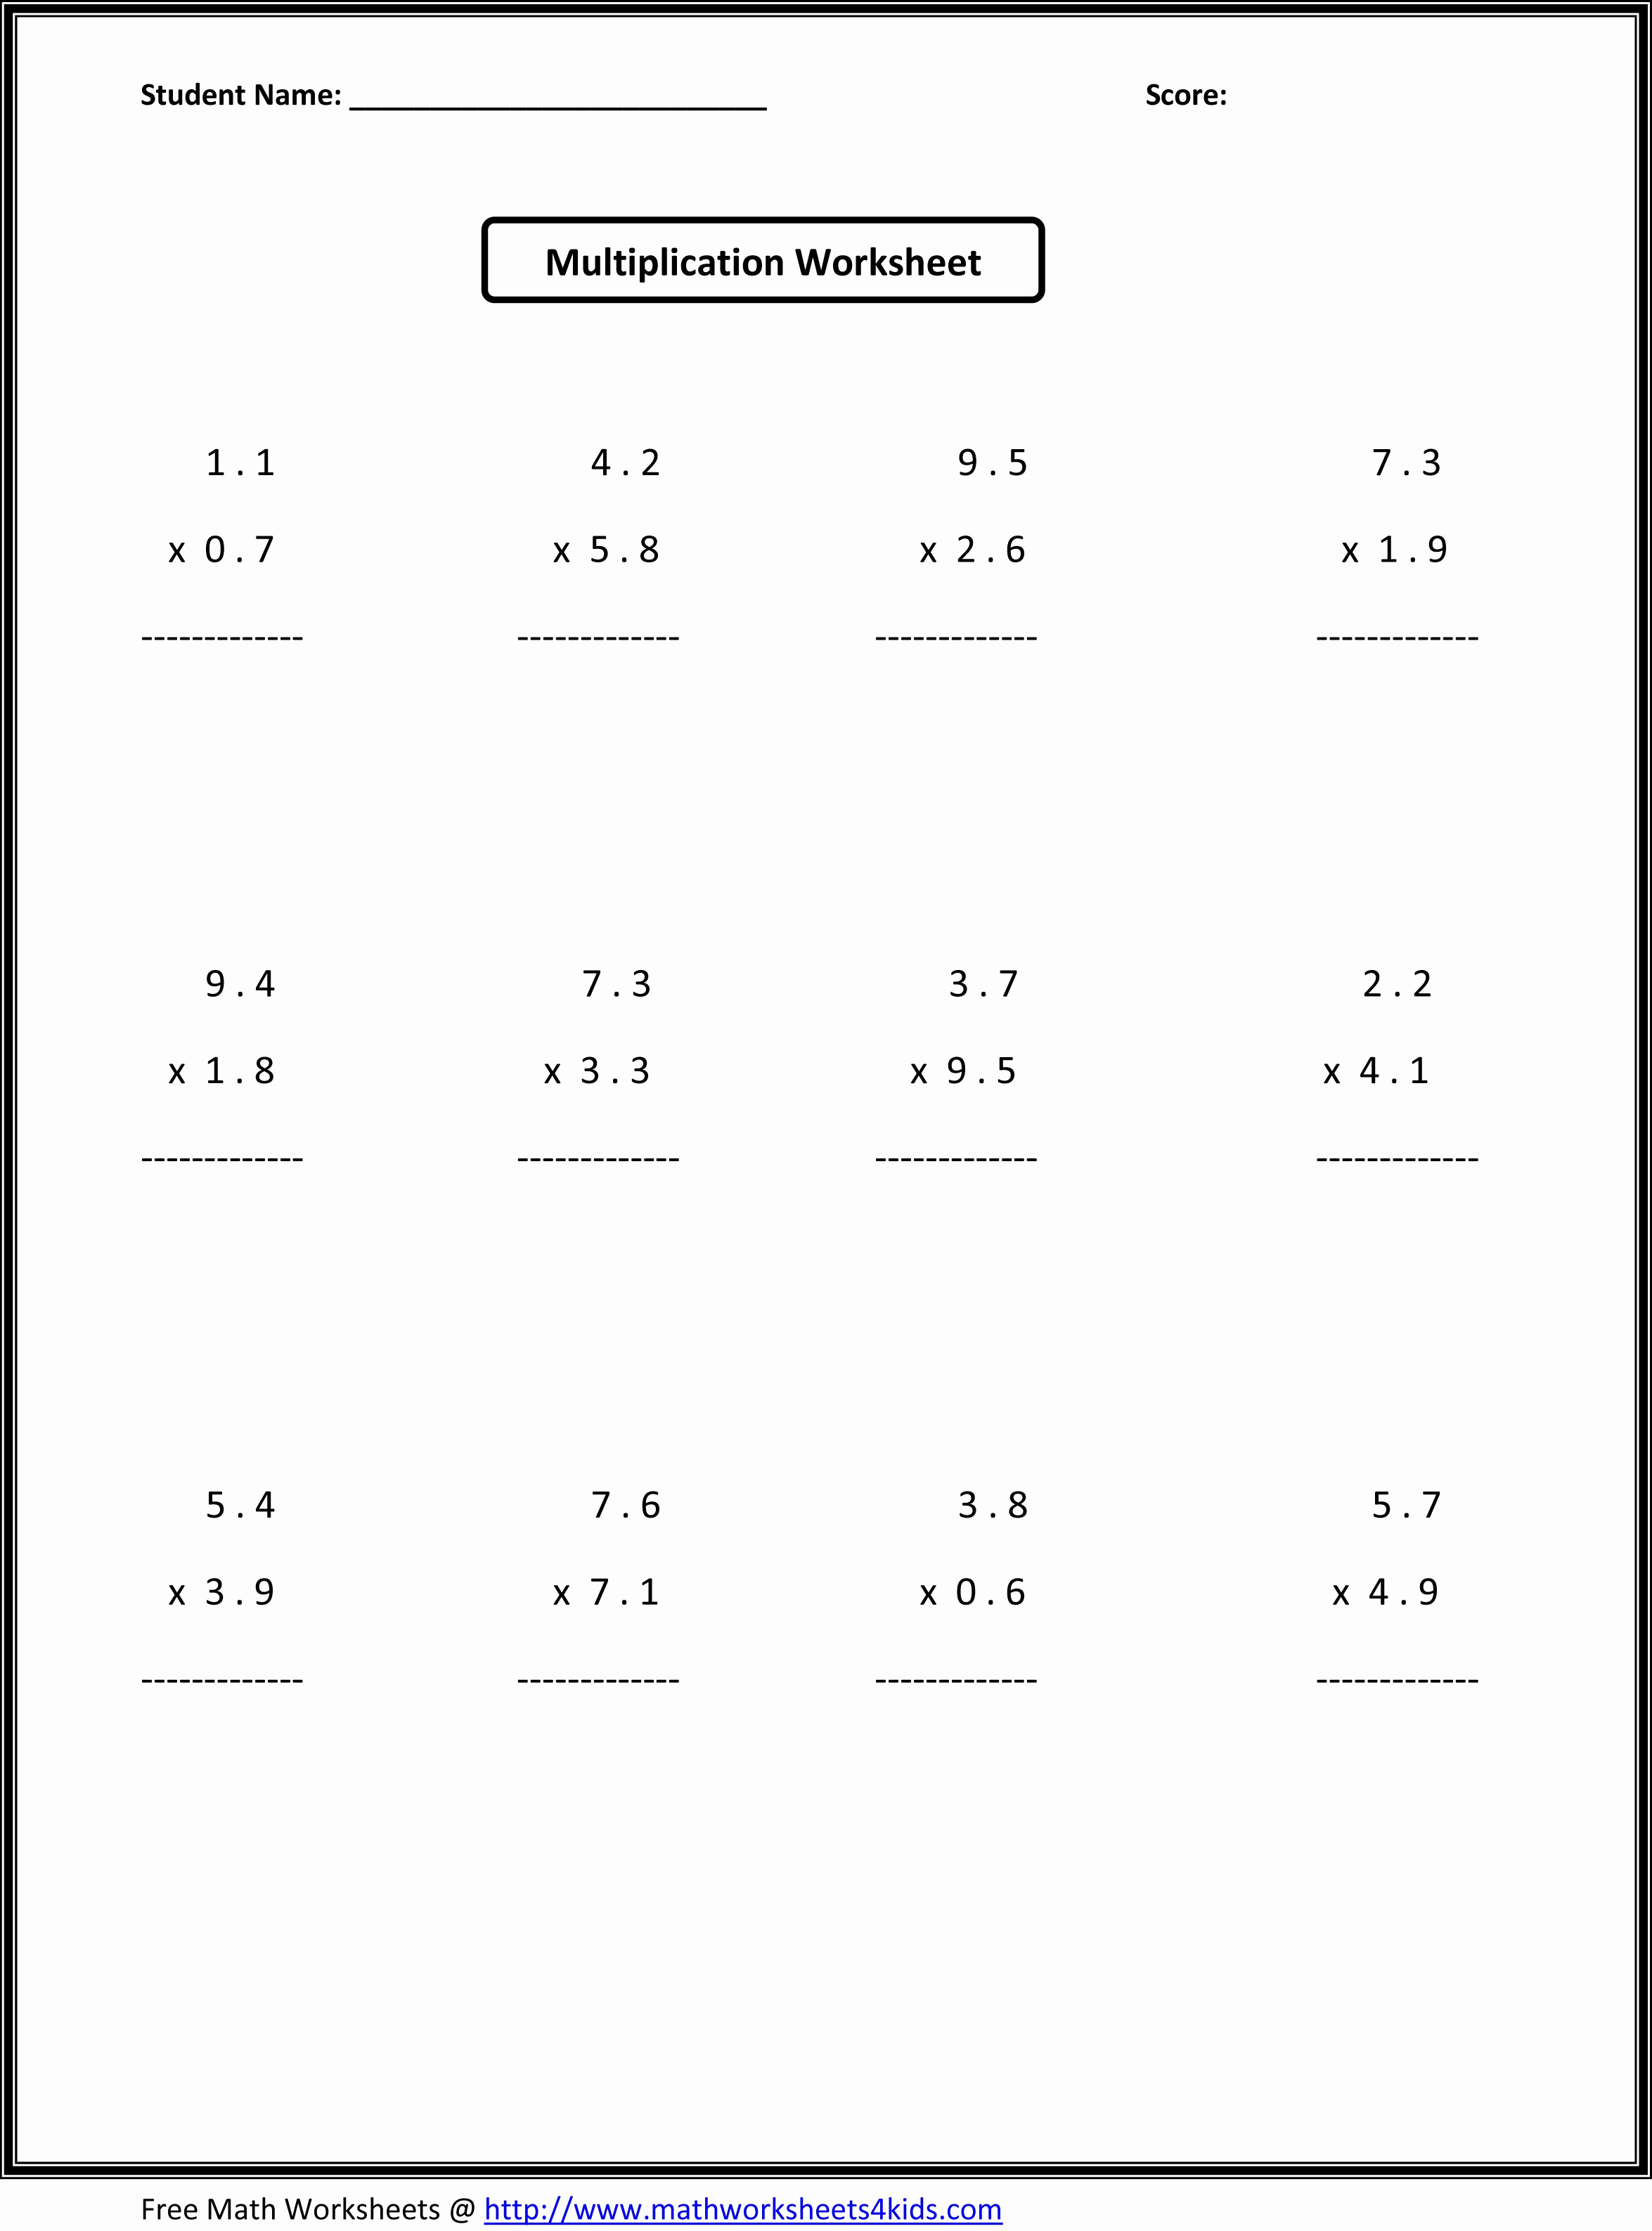 7th Grade Algebra Worksheets Beautiful 7th Grade Math Worksheets